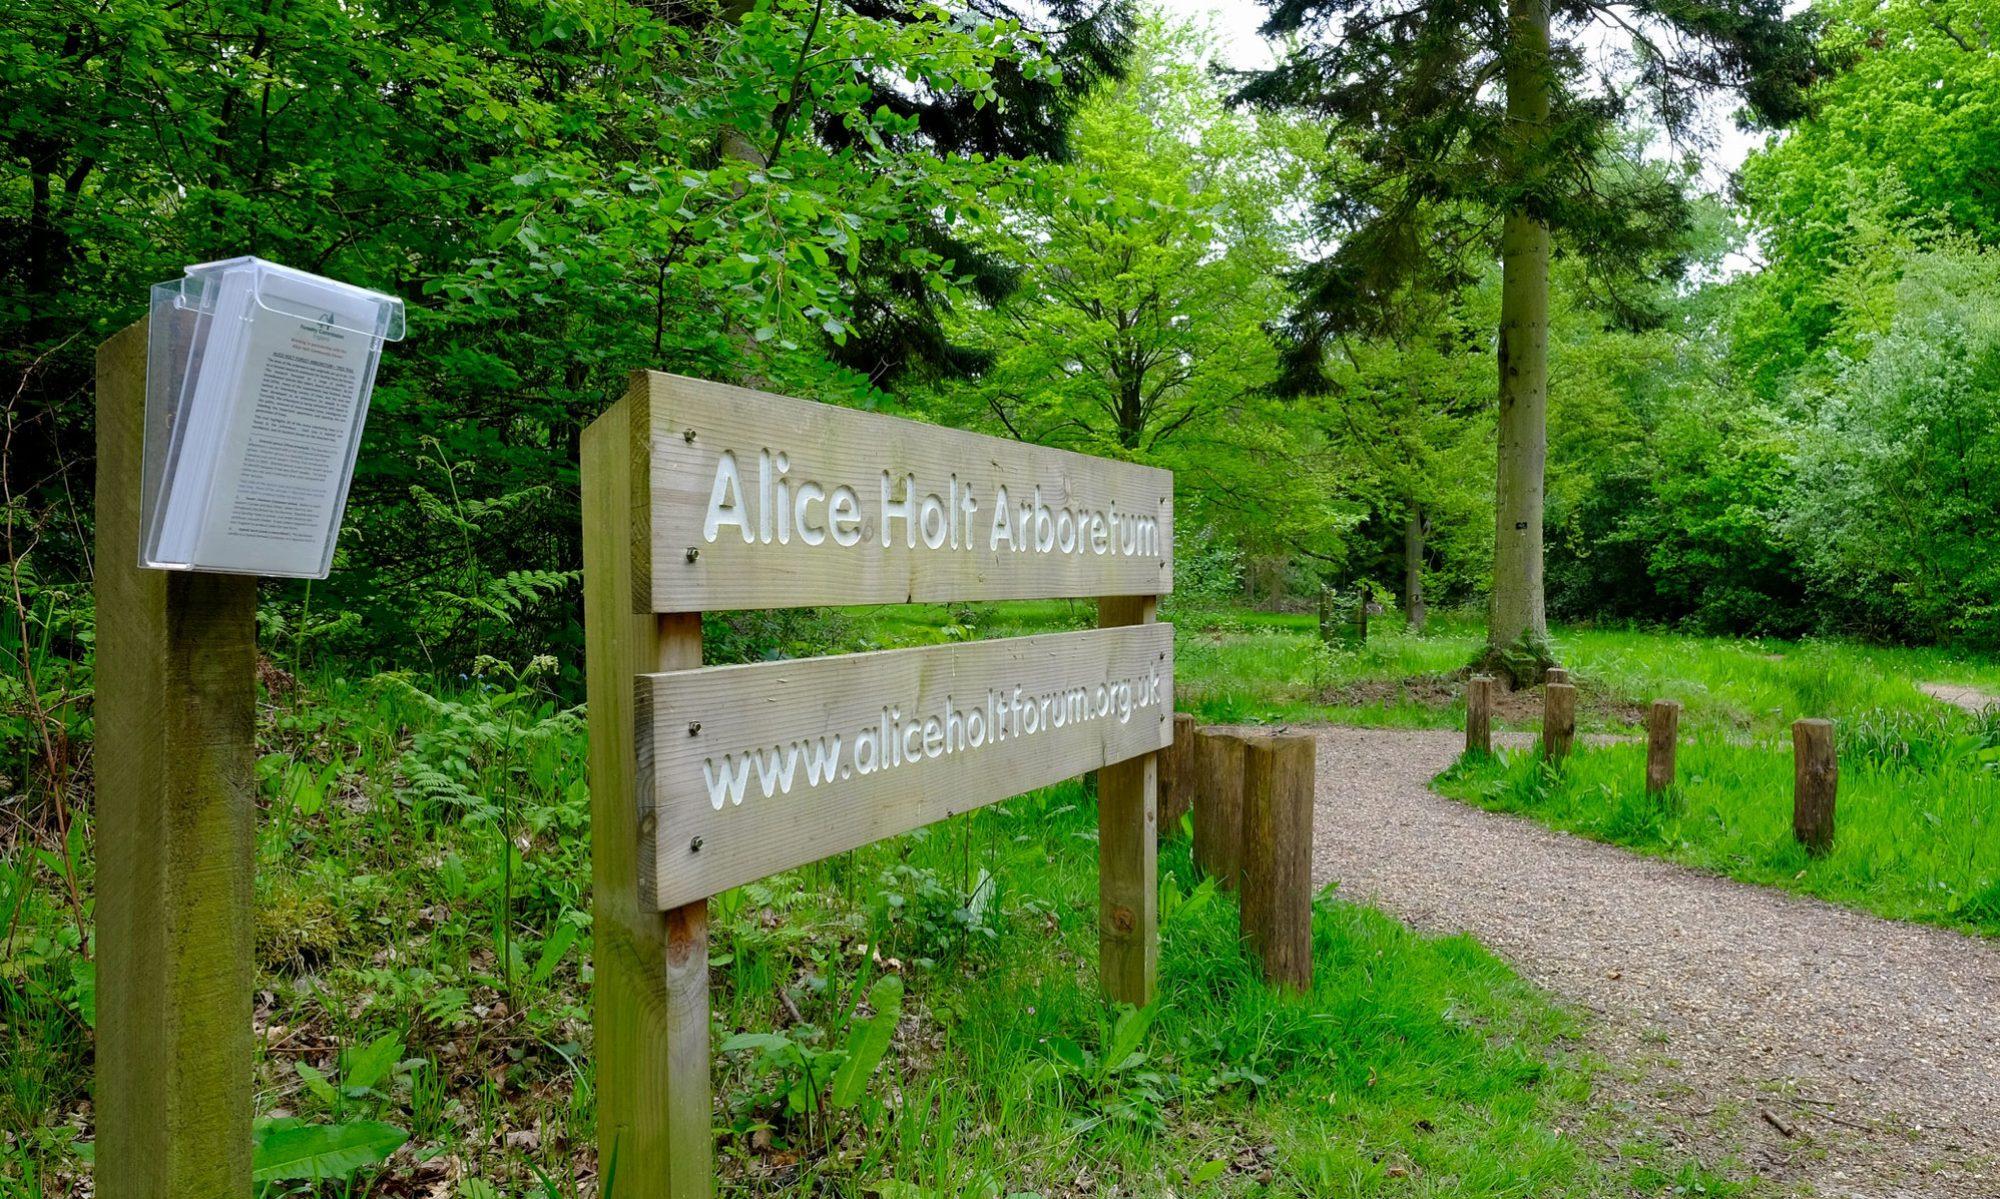 Alice Holt Community Forum